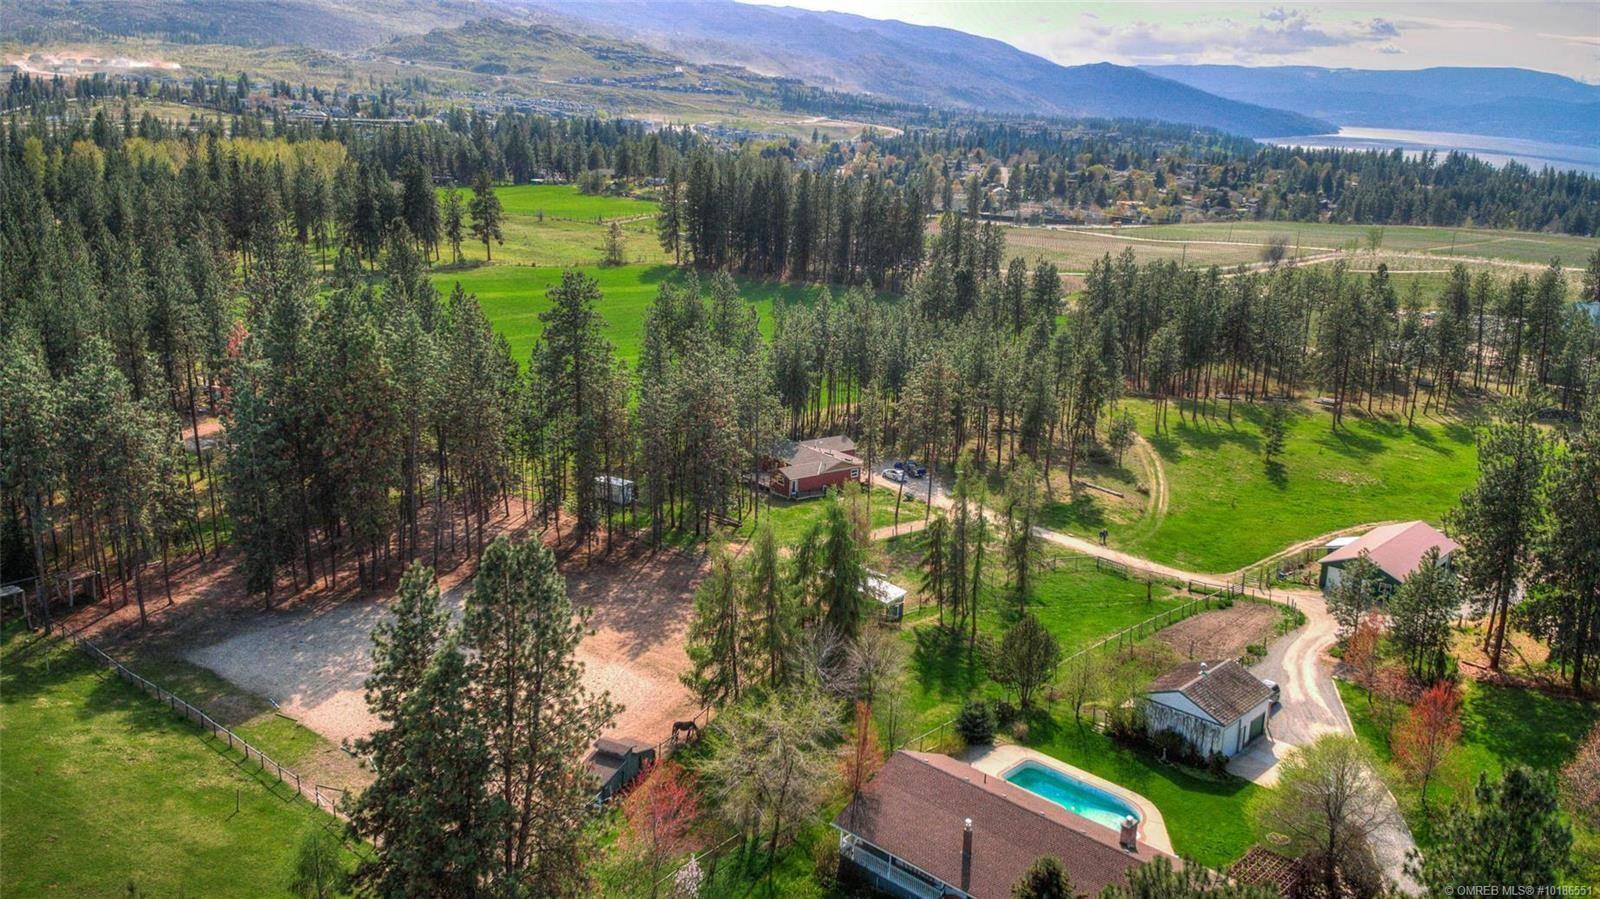 House for sale at 4510 Stewart Rd East Kelowna British Columbia - MLS: 10186551